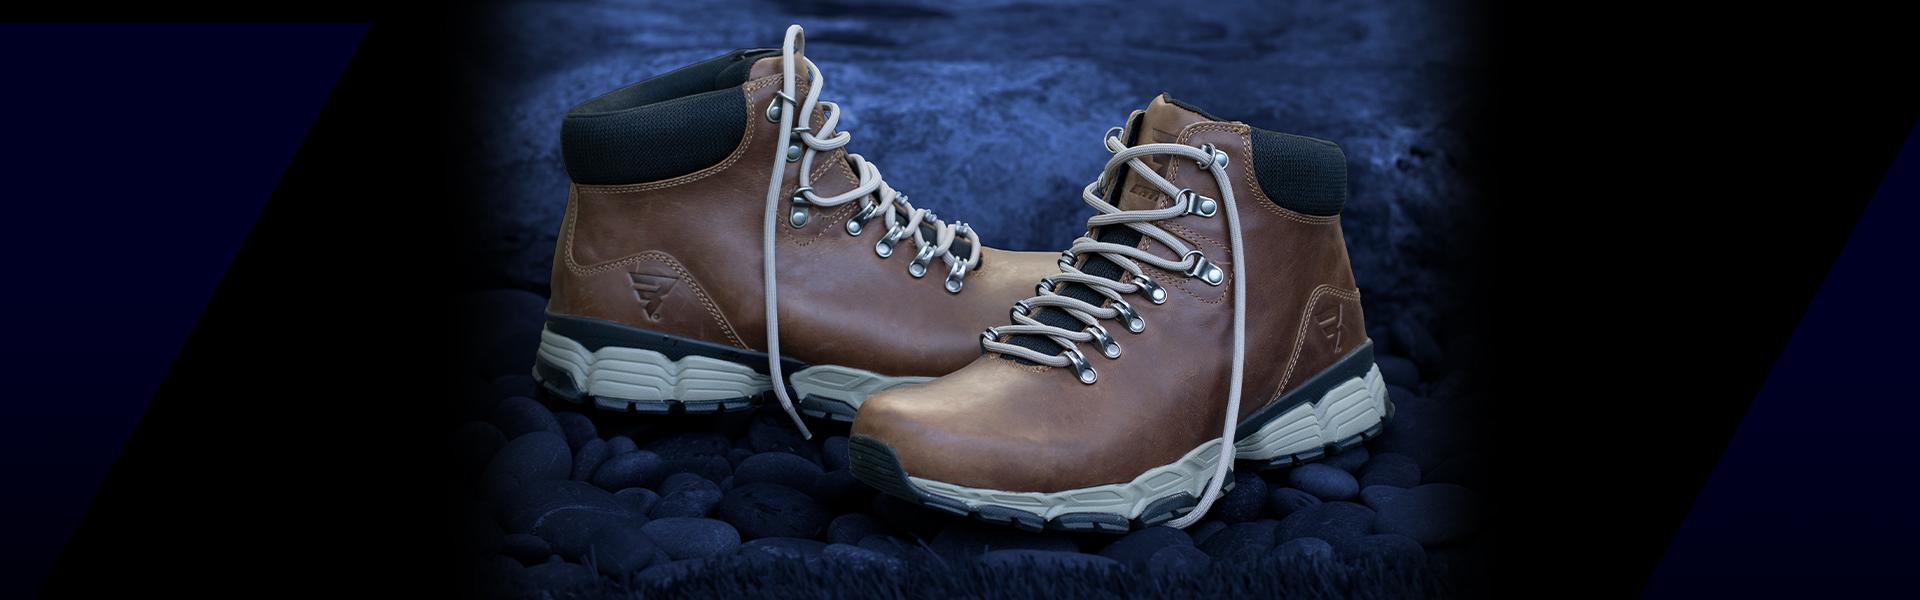 Bates Hiking Boots.